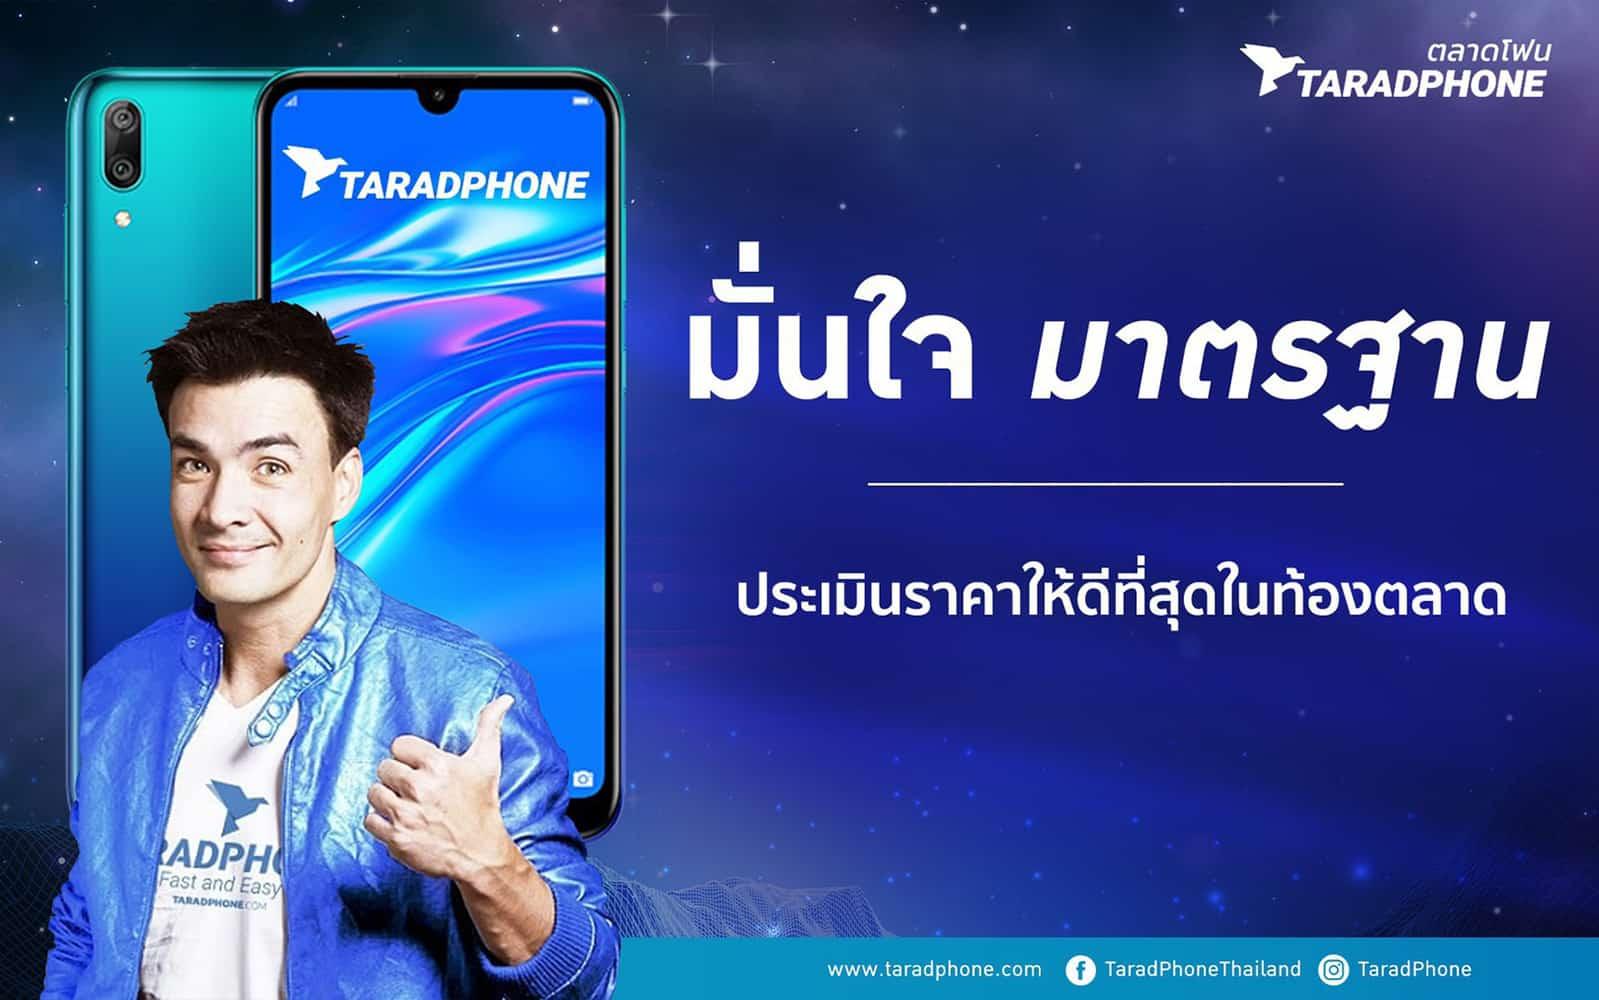 taradphone munjai 2 - Taradphone.com เร่งสร้างมาตรฐานตรวจเช็คคุณภาพ เพิ่มความมั่นใจลูกค้าทั่วประเทศ